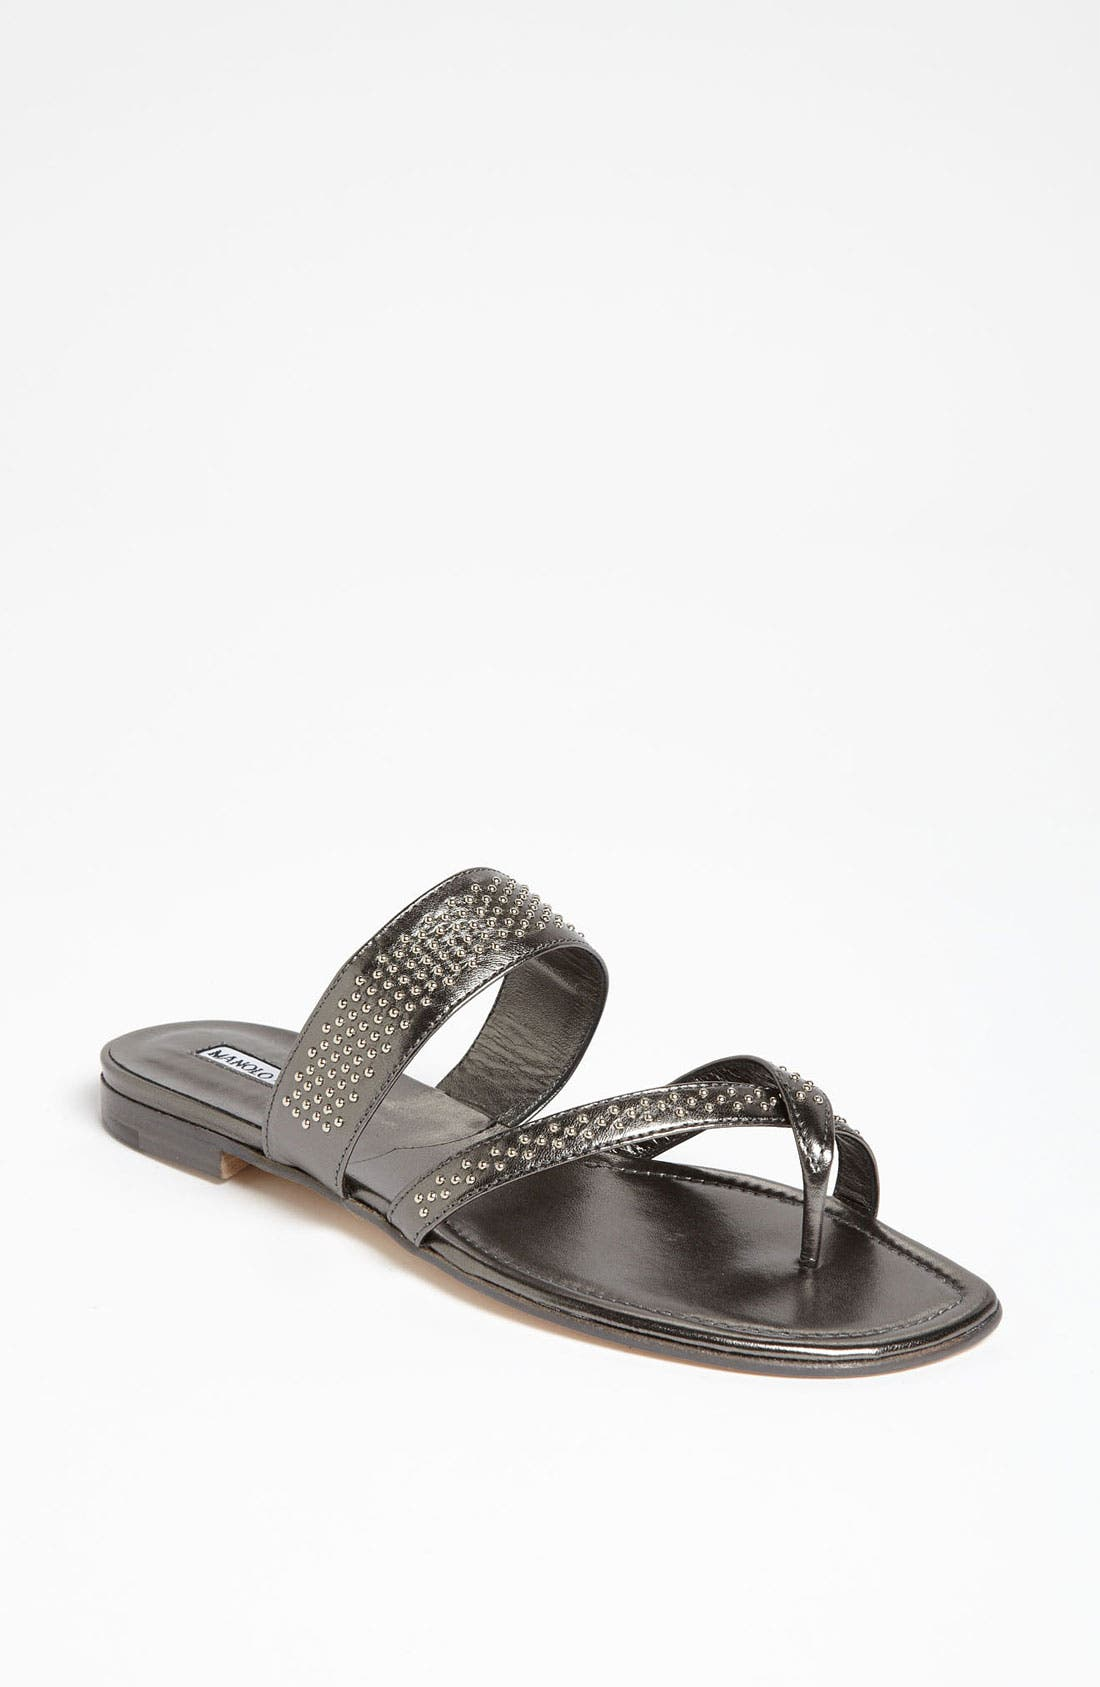 Alternate Image 1 Selected - Manolo Blahnik 'Susabor' Sandal